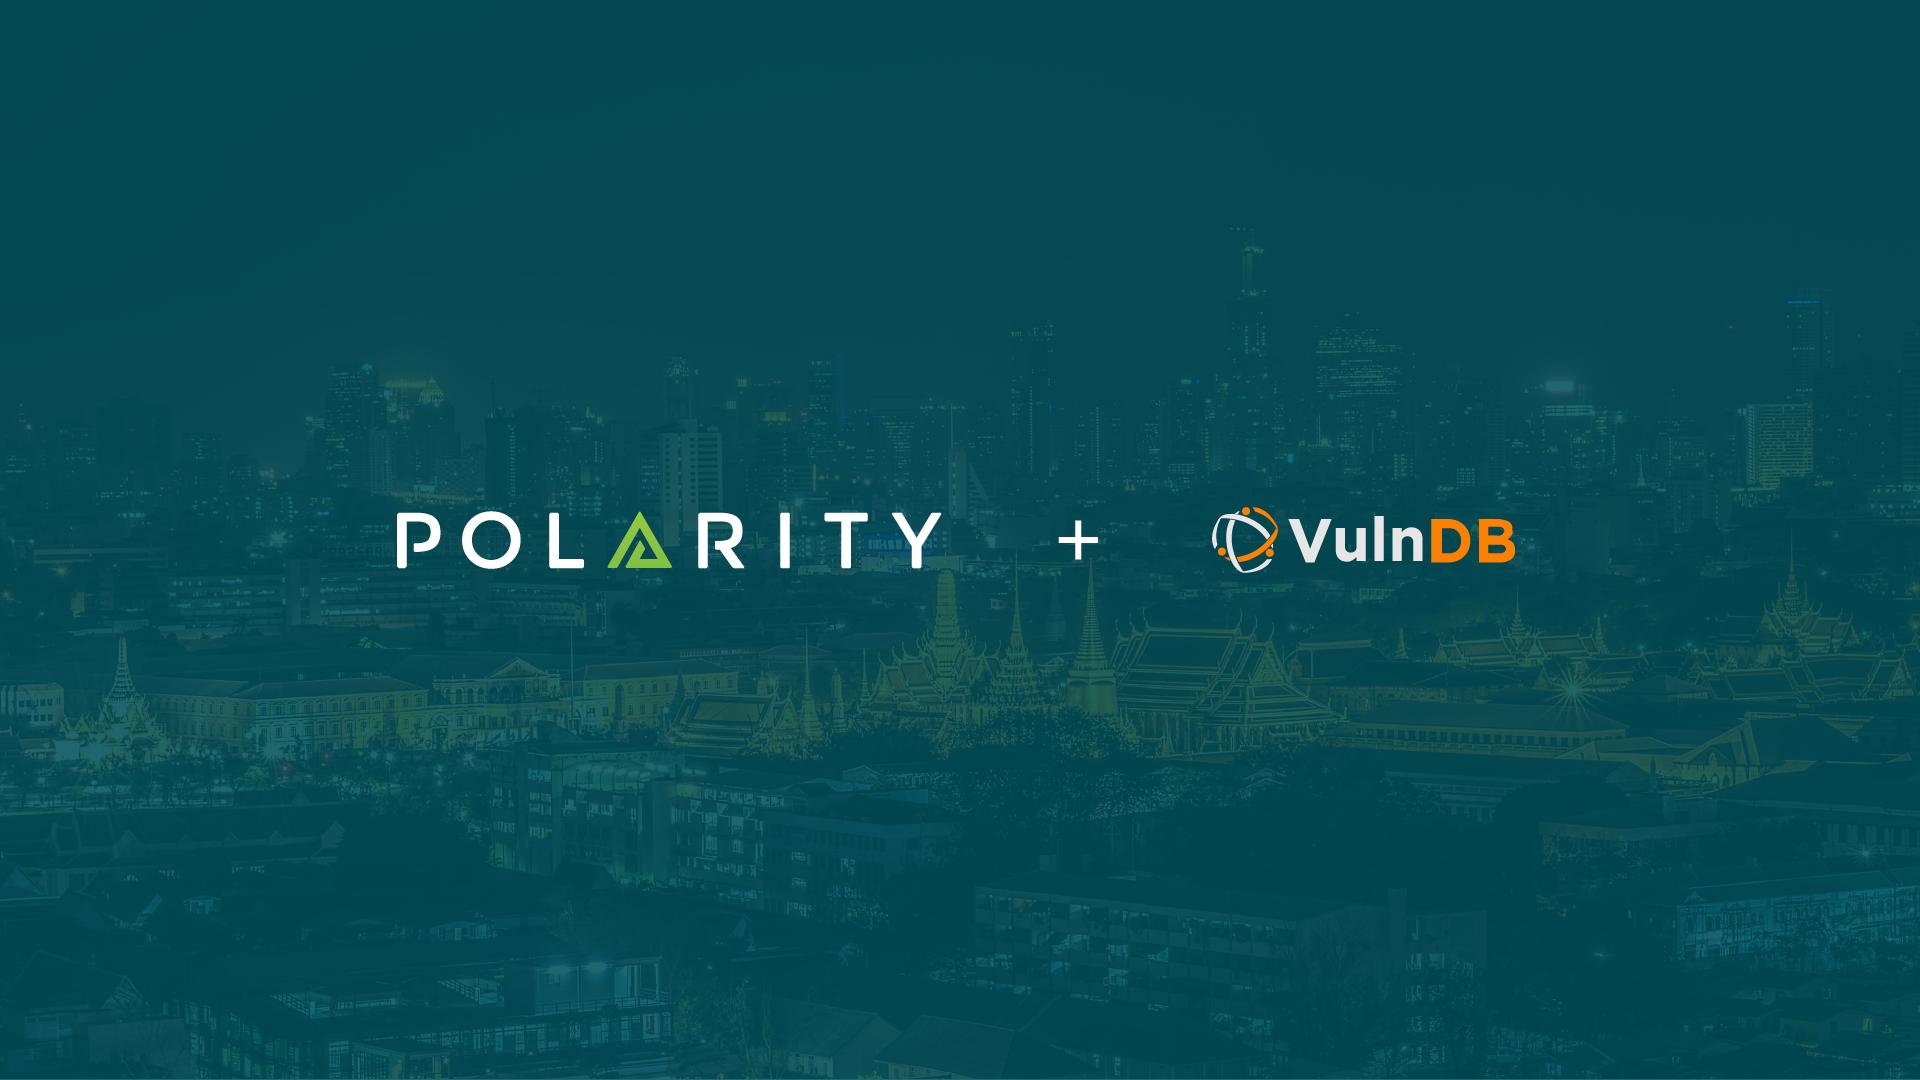 Polarity - VulnDB Integration cover image